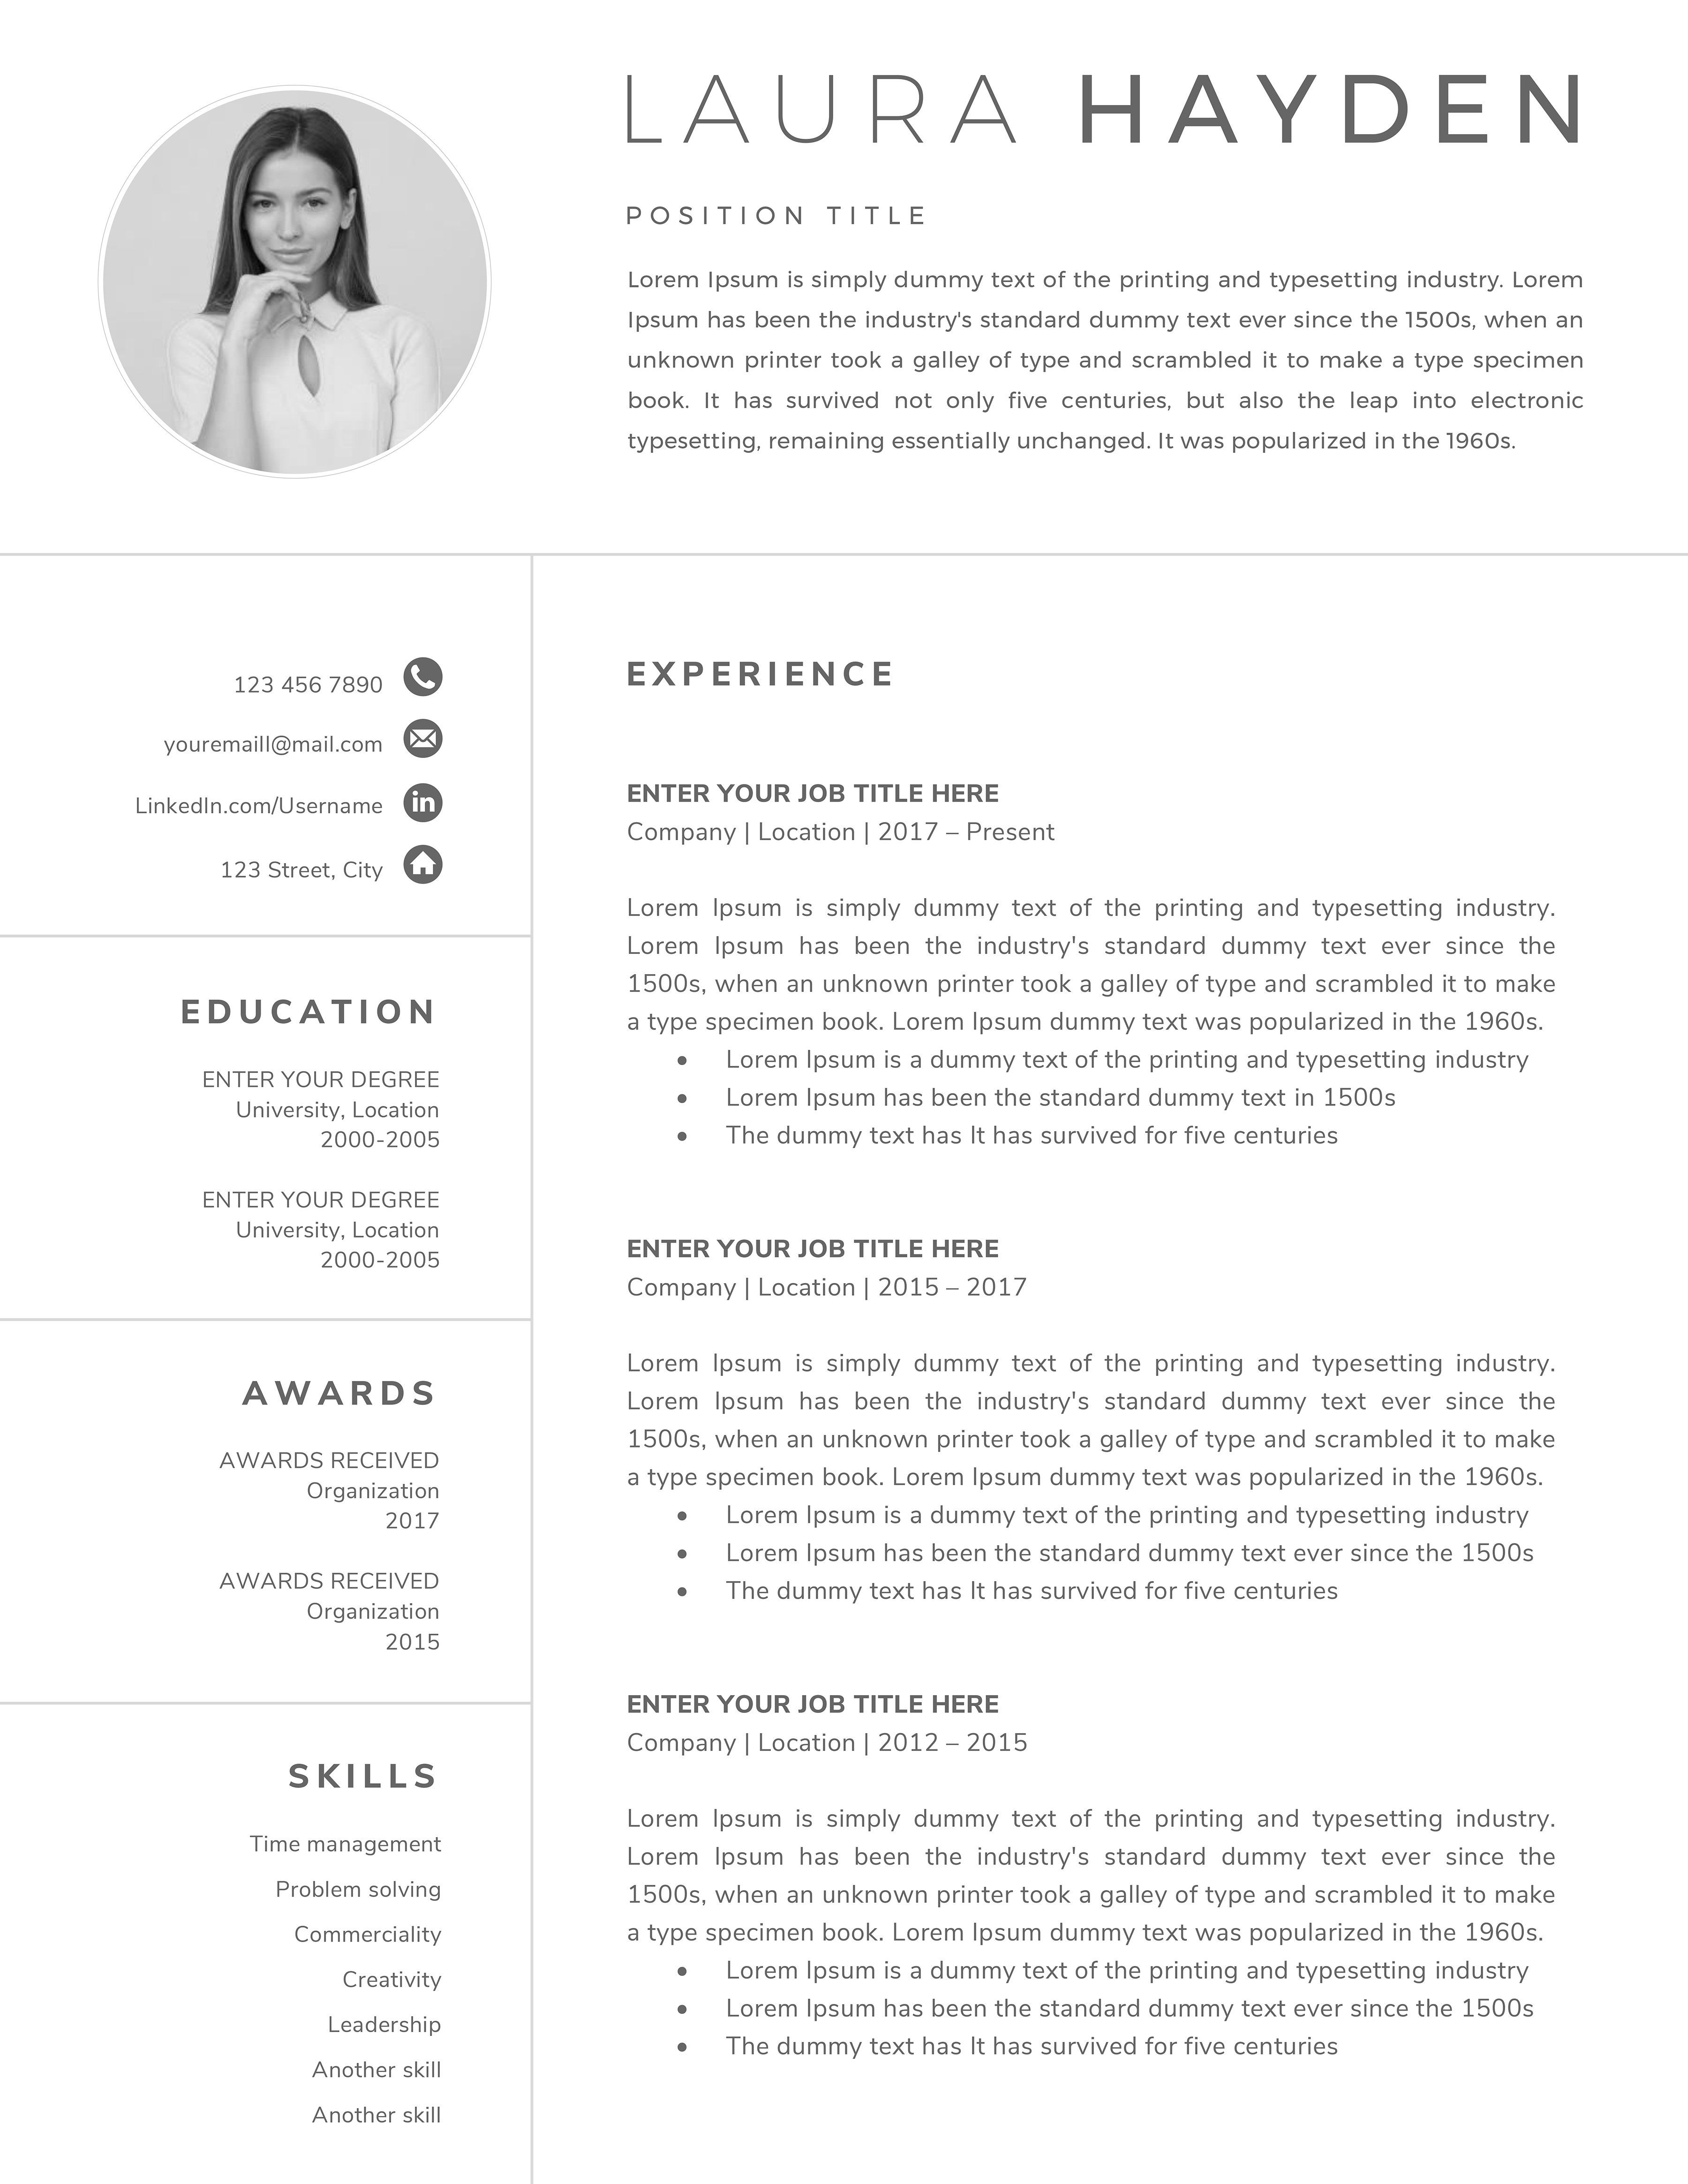 Resume Template Cv Resume Template Word Resume Template Professional Resume Template